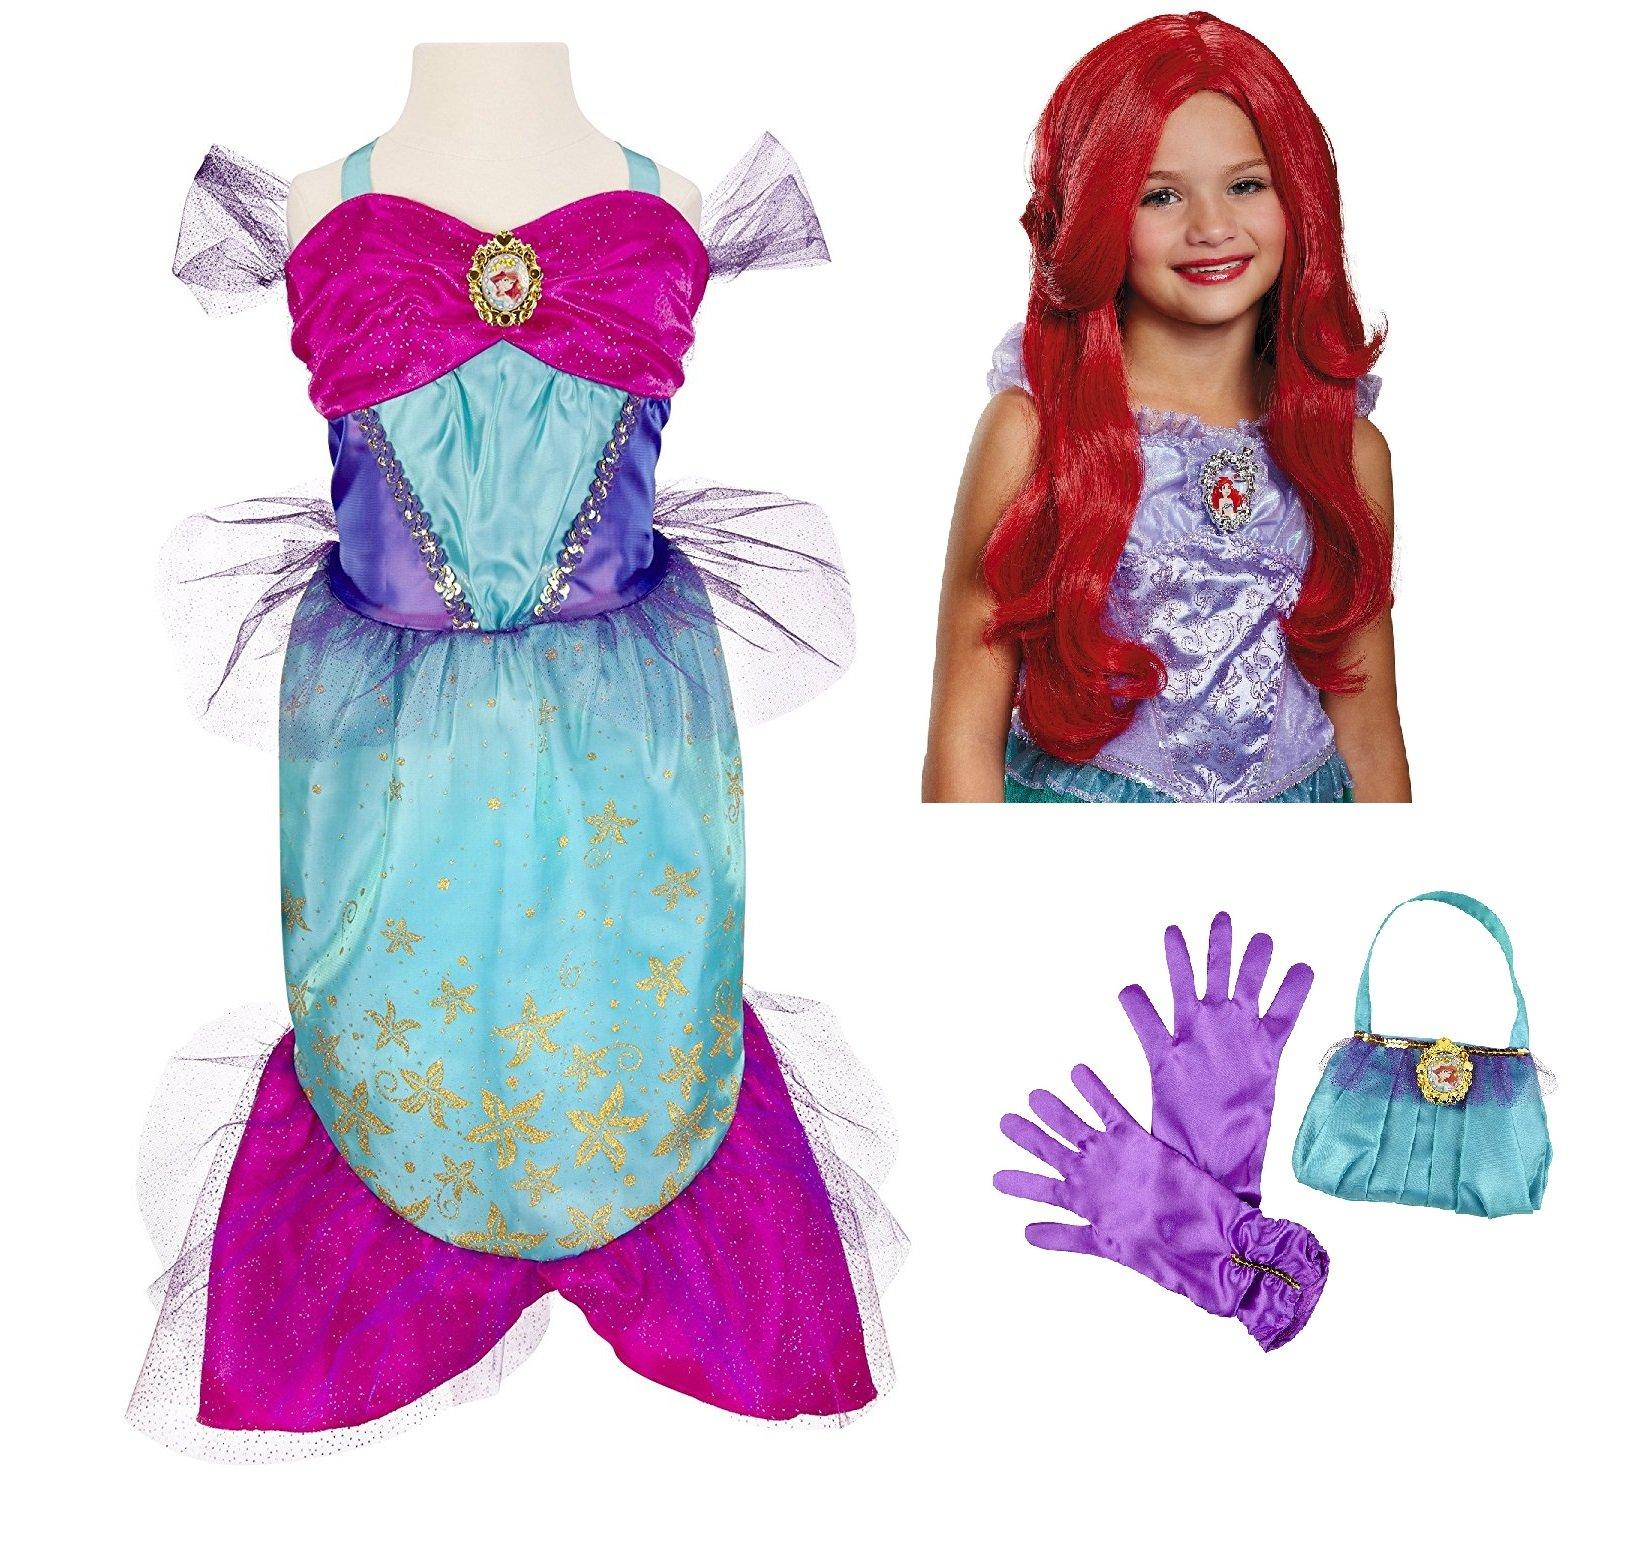 Disney Princess Ariel Little Mermaid Costume - Dress, Wig, Purse, Gloves Teal